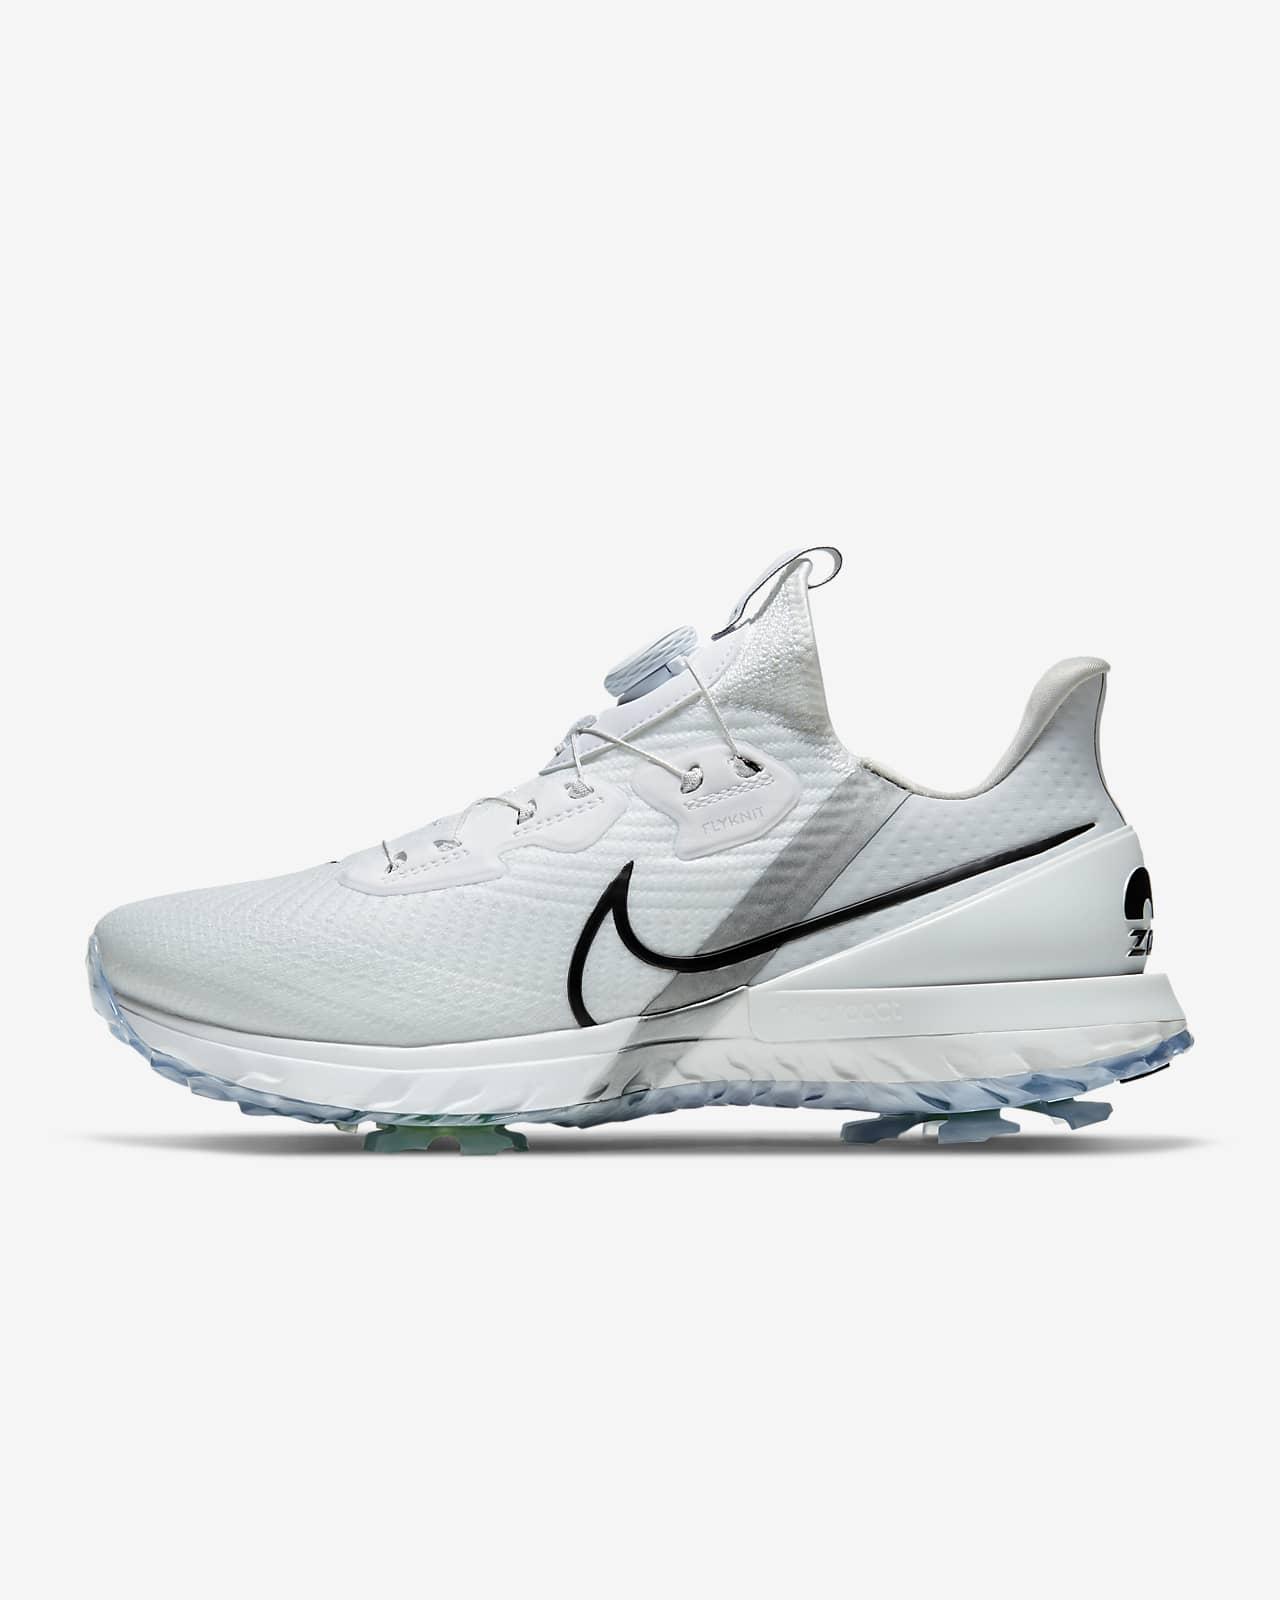 Nike Air Zoom Infinity Tour BOA Golf